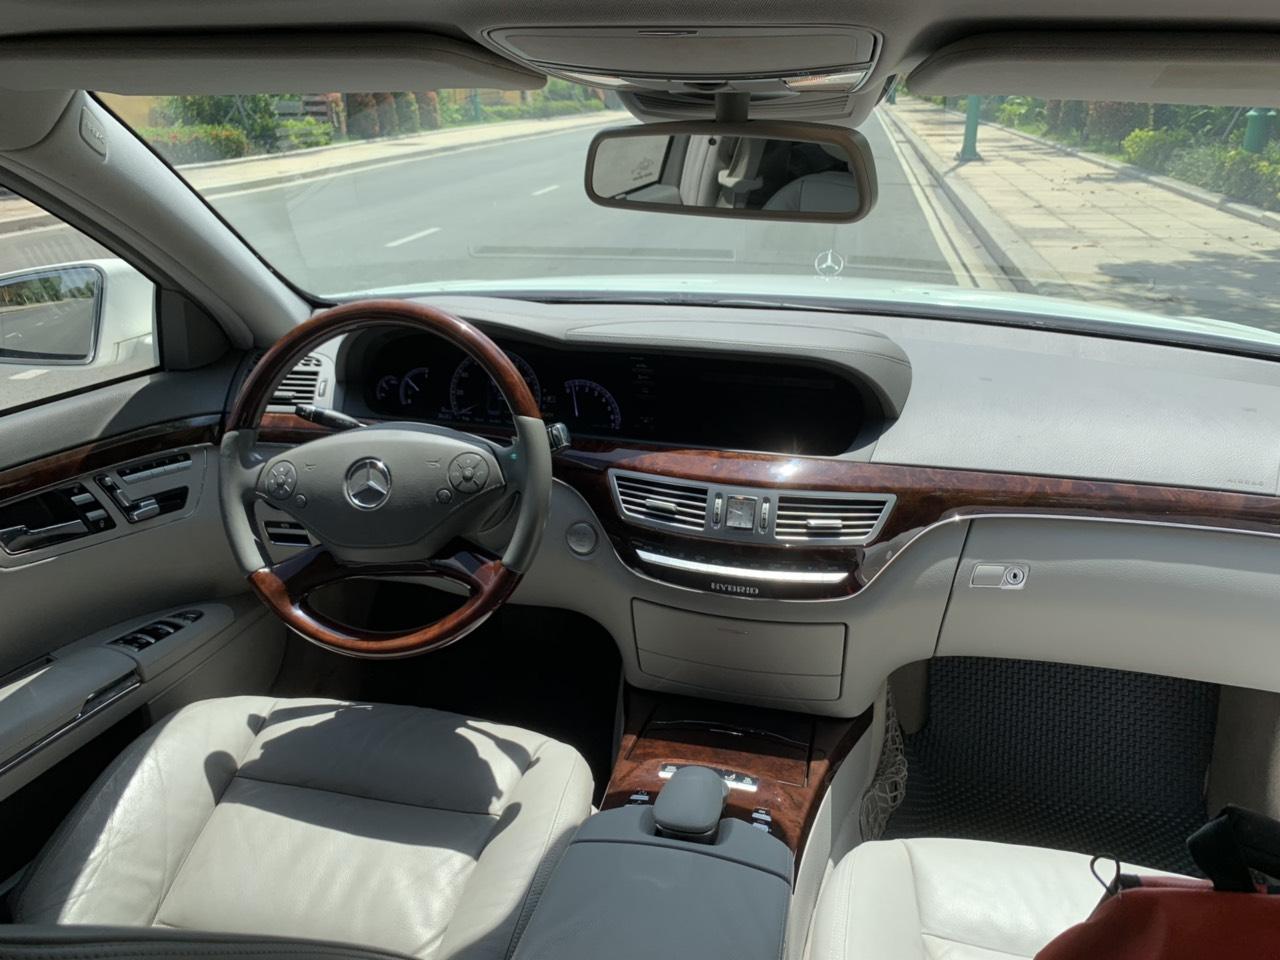 Cần bán Mercedes S400 Hybrid 2012 nhập khẩu